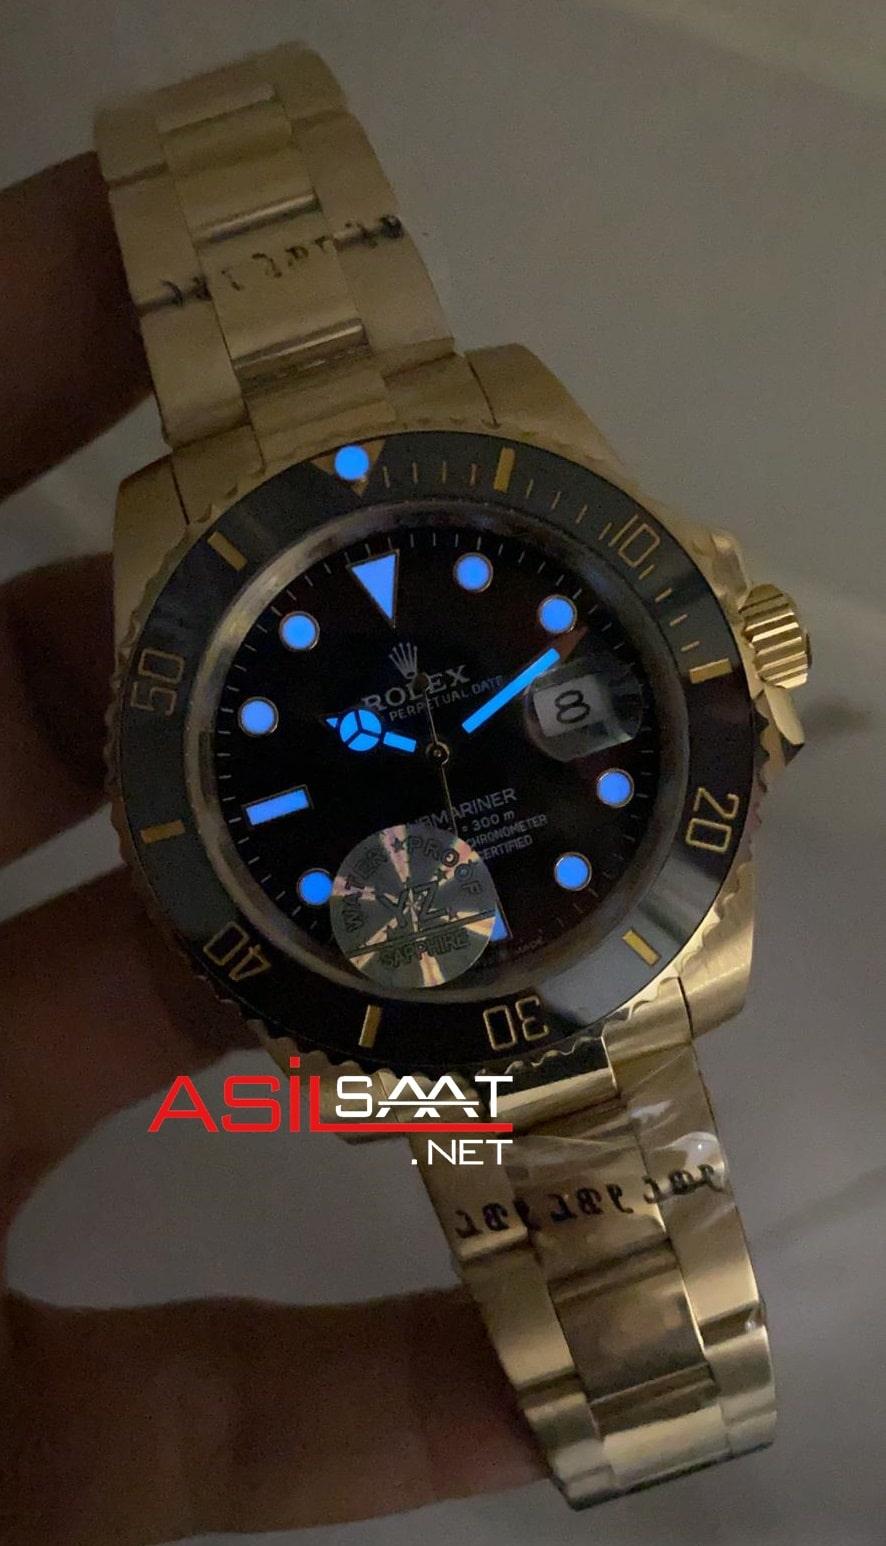 Rolex Oyster Perpetual Submariner Gold Replika Saat ROLS011